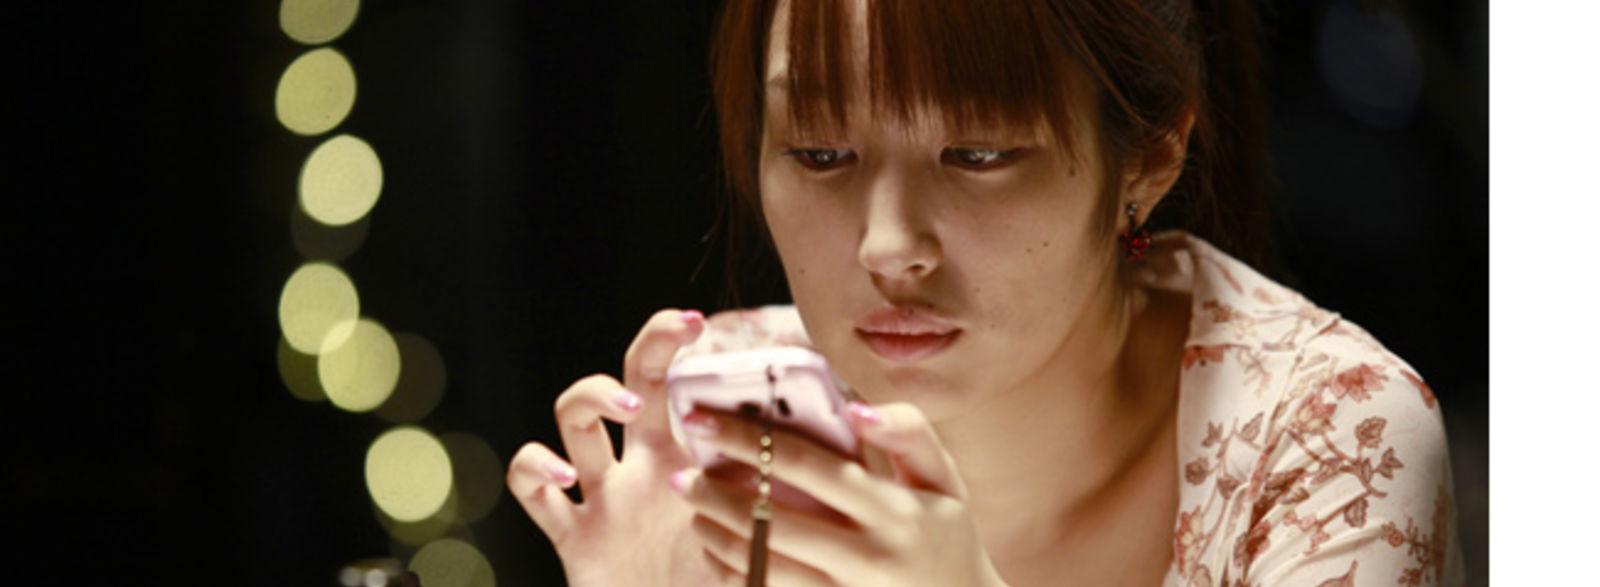 «Like someone in love» d'Abbas Kiarostami; «Vous n'avez encore rien vu» d'Alain Resnais; «In another country» de Hong Sangsoo